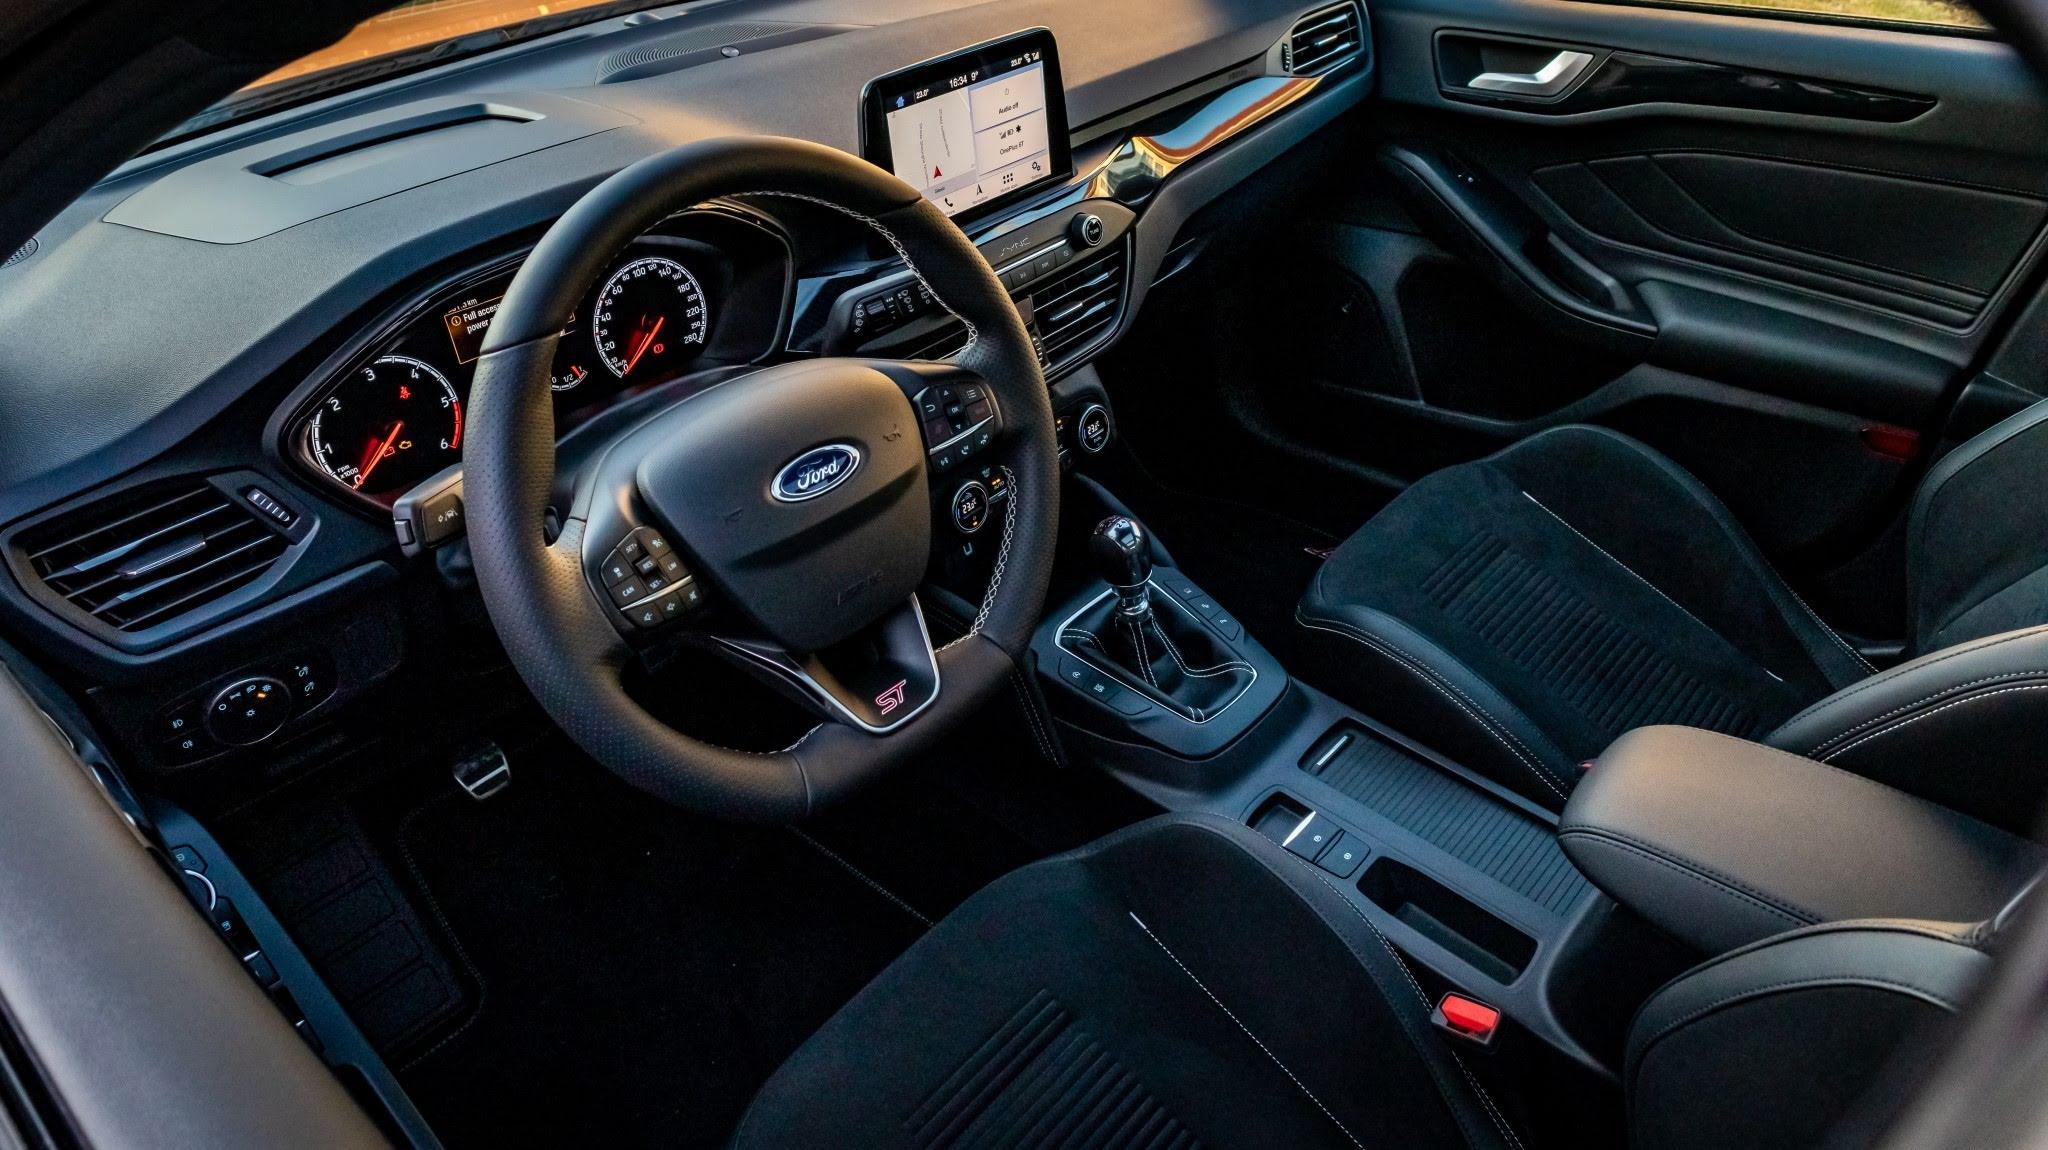 Ford Focus ST 2019 2.0 EcoBlue 190 CP M6